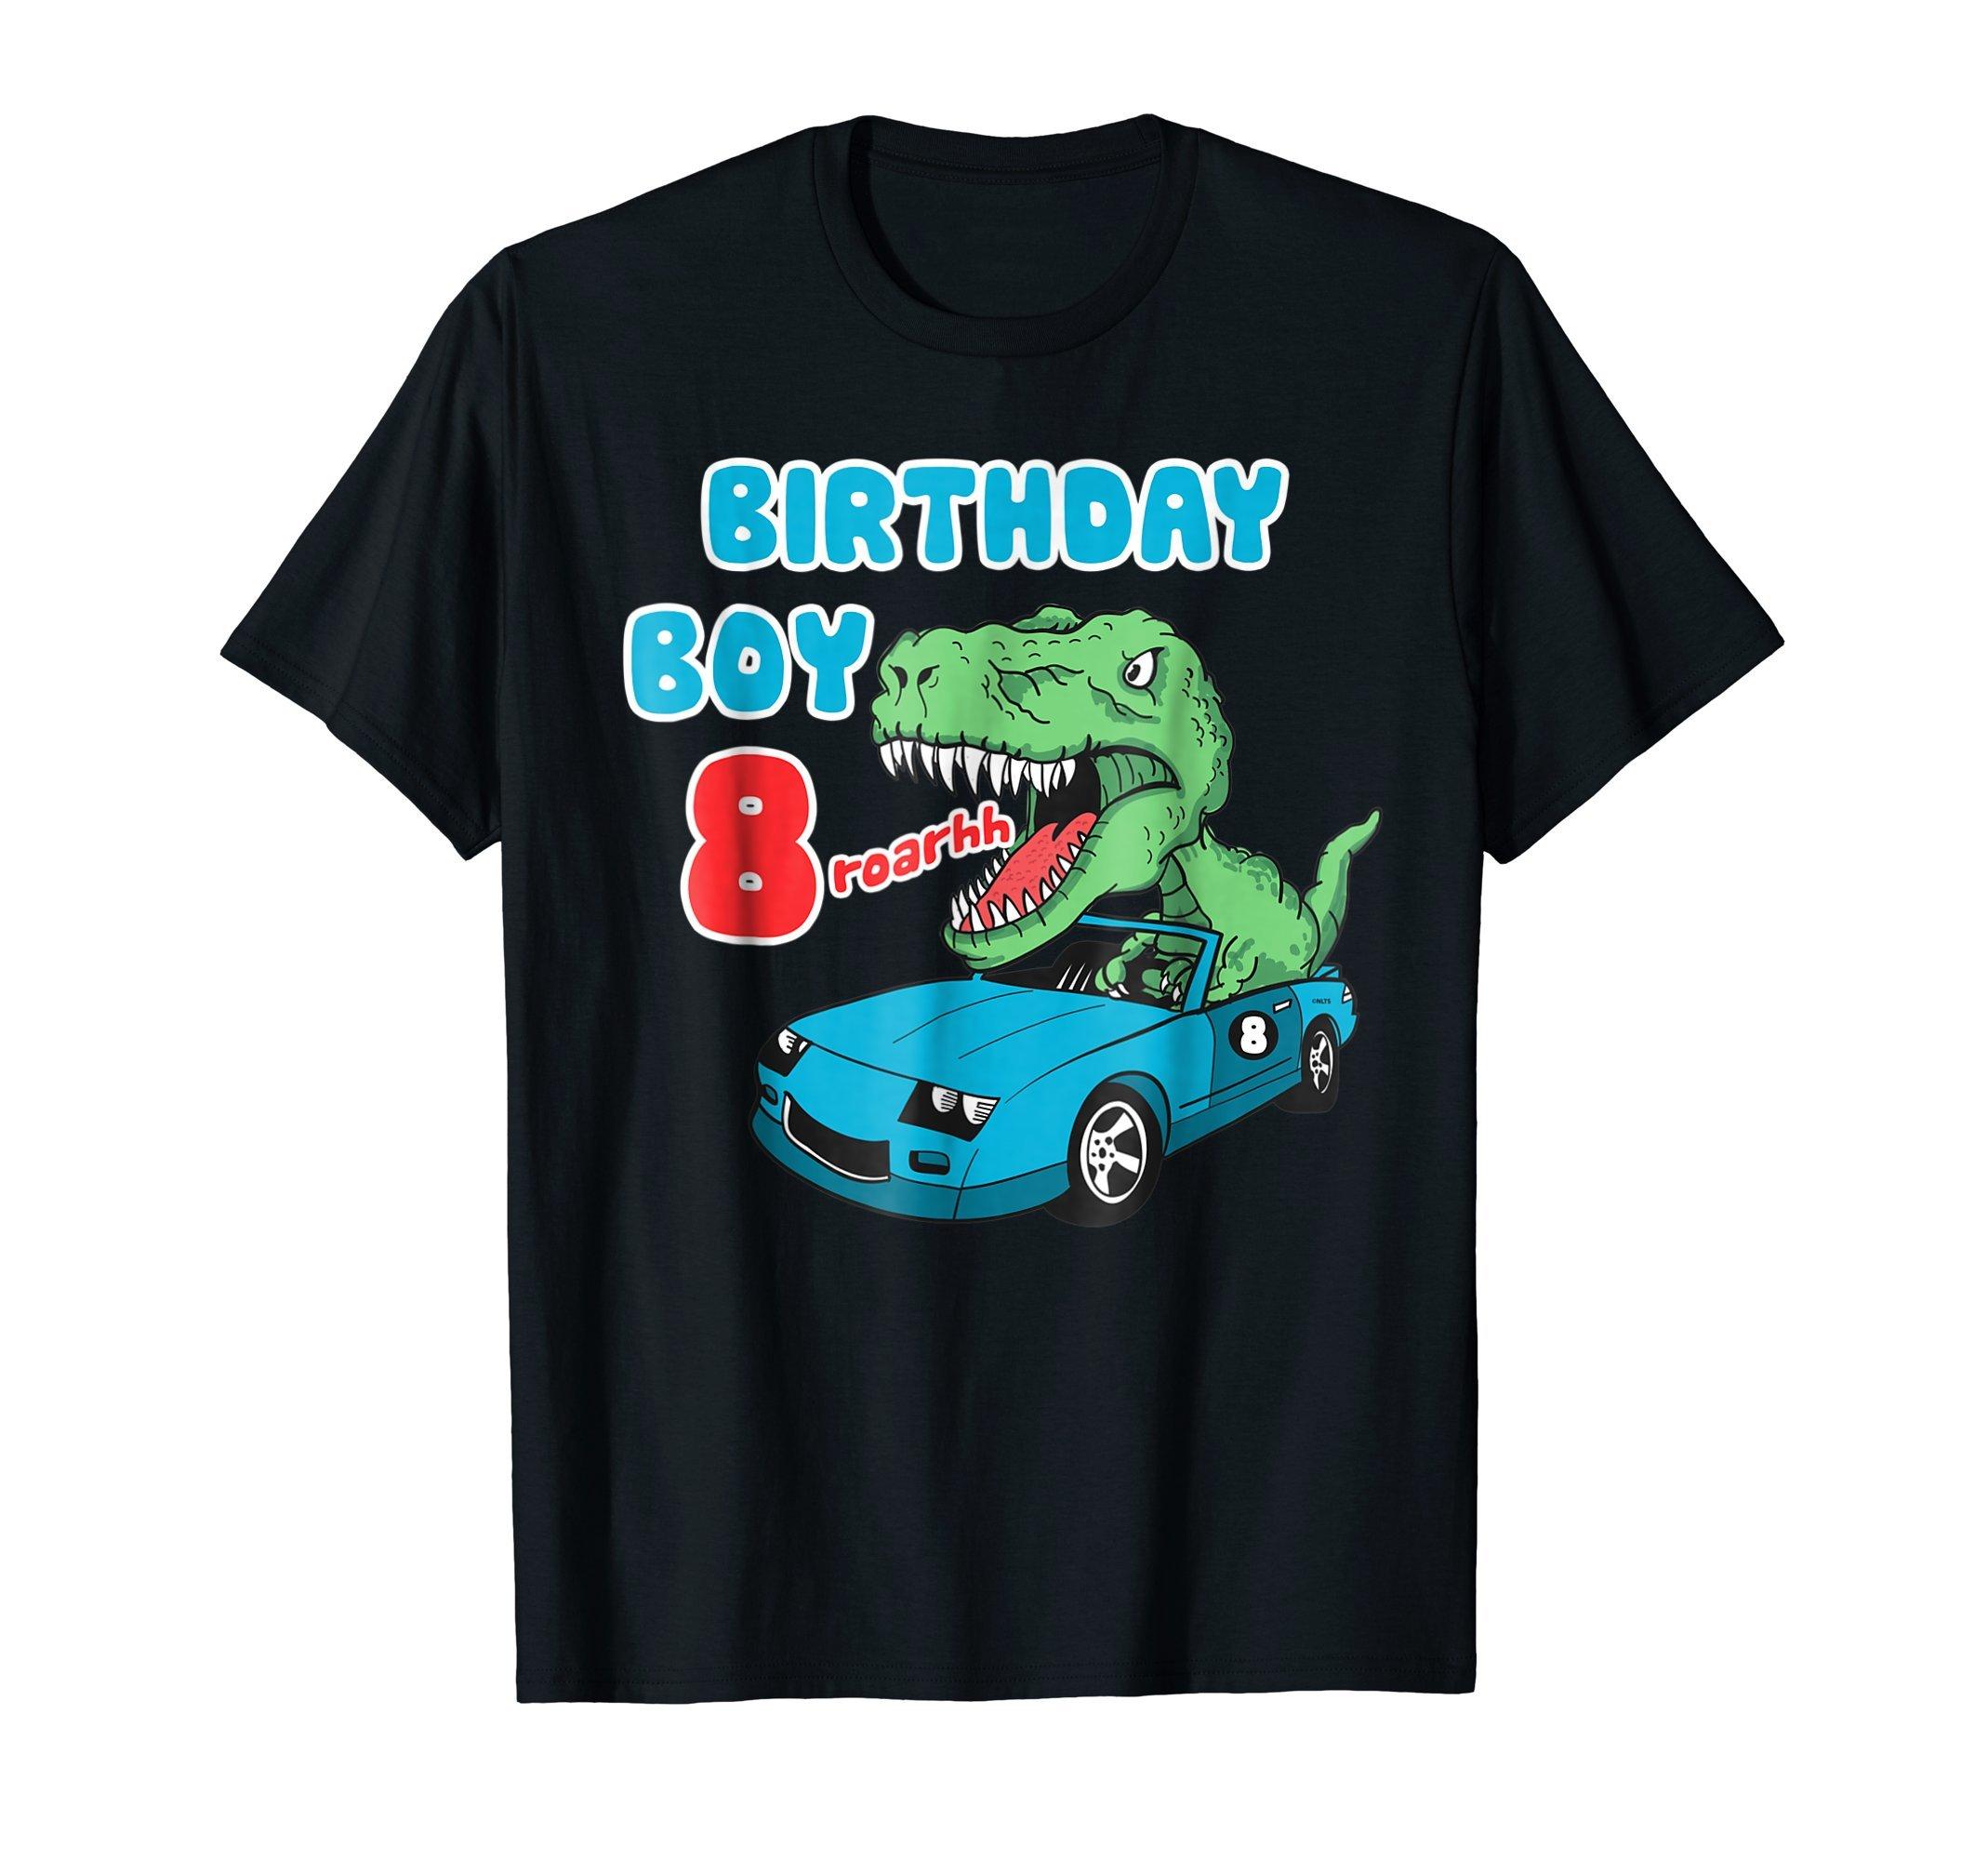 Dinosaur-Racer-Birthday-Boy-8th-Birthday-Fun-Humor-T-Shirt-T